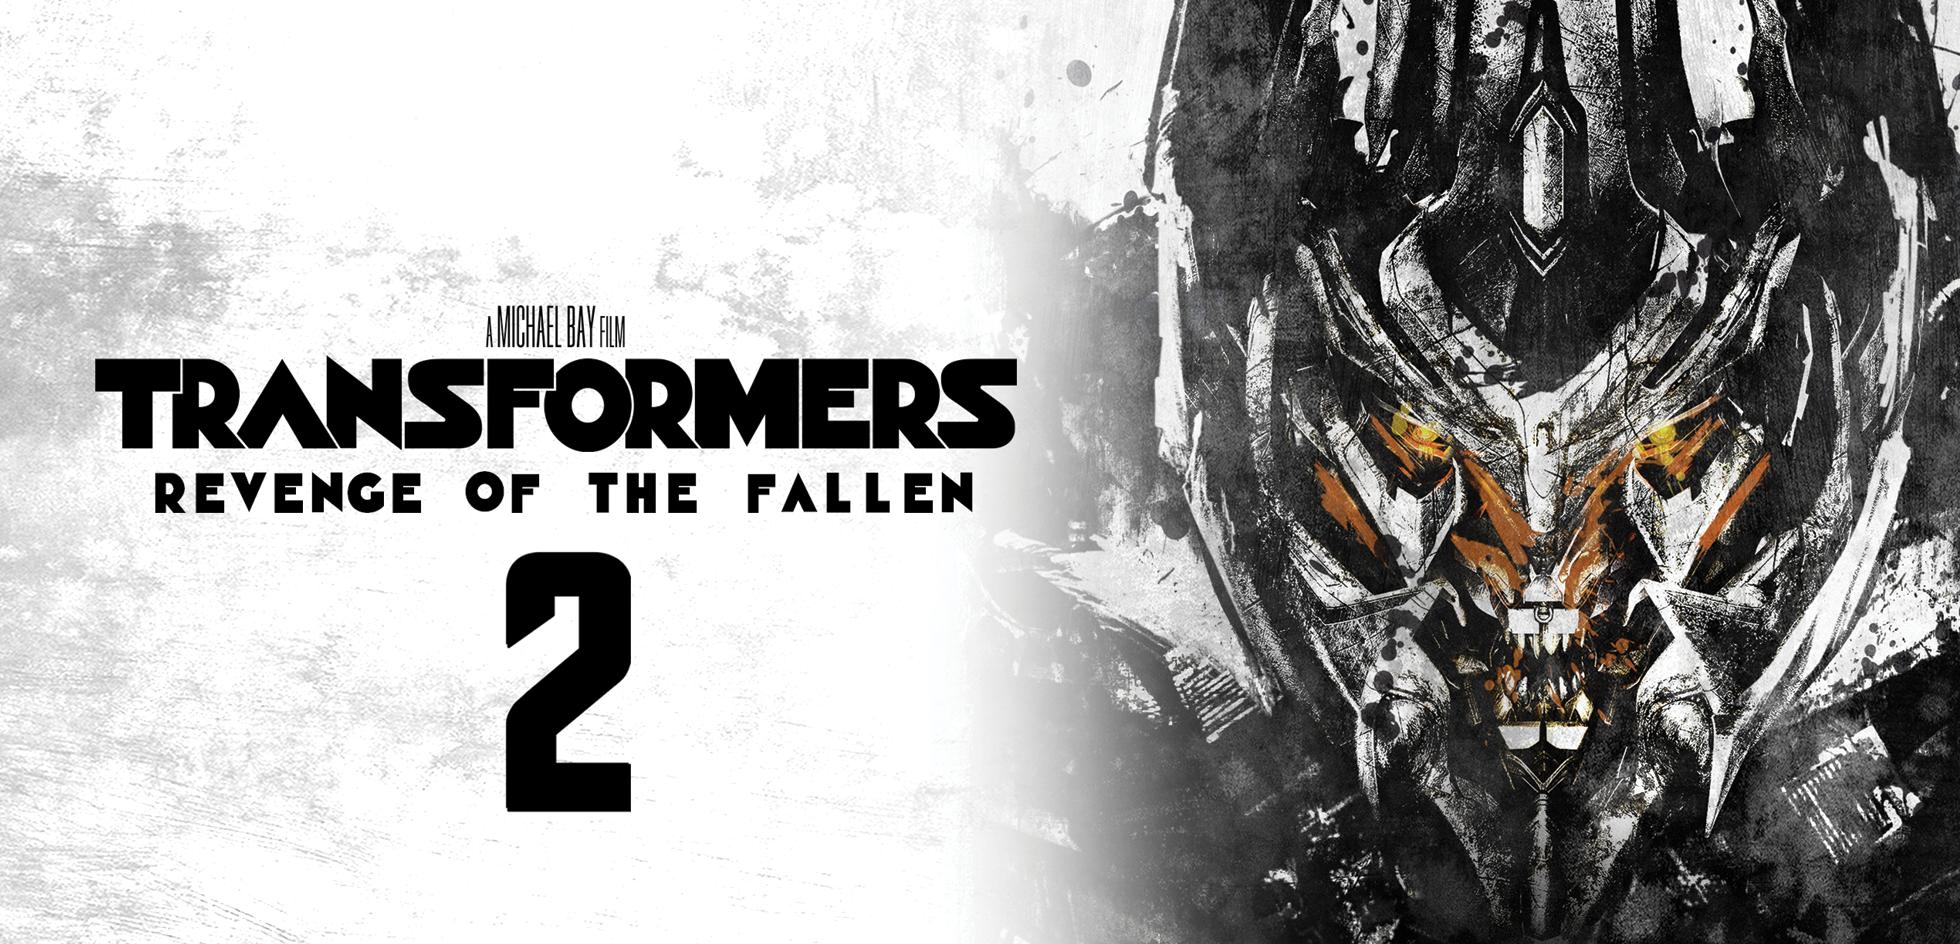 Transformers: Revenge of the Fallen ทรานส์ฟอร์มเมอร์ส อภิมหาสงครามแค้น